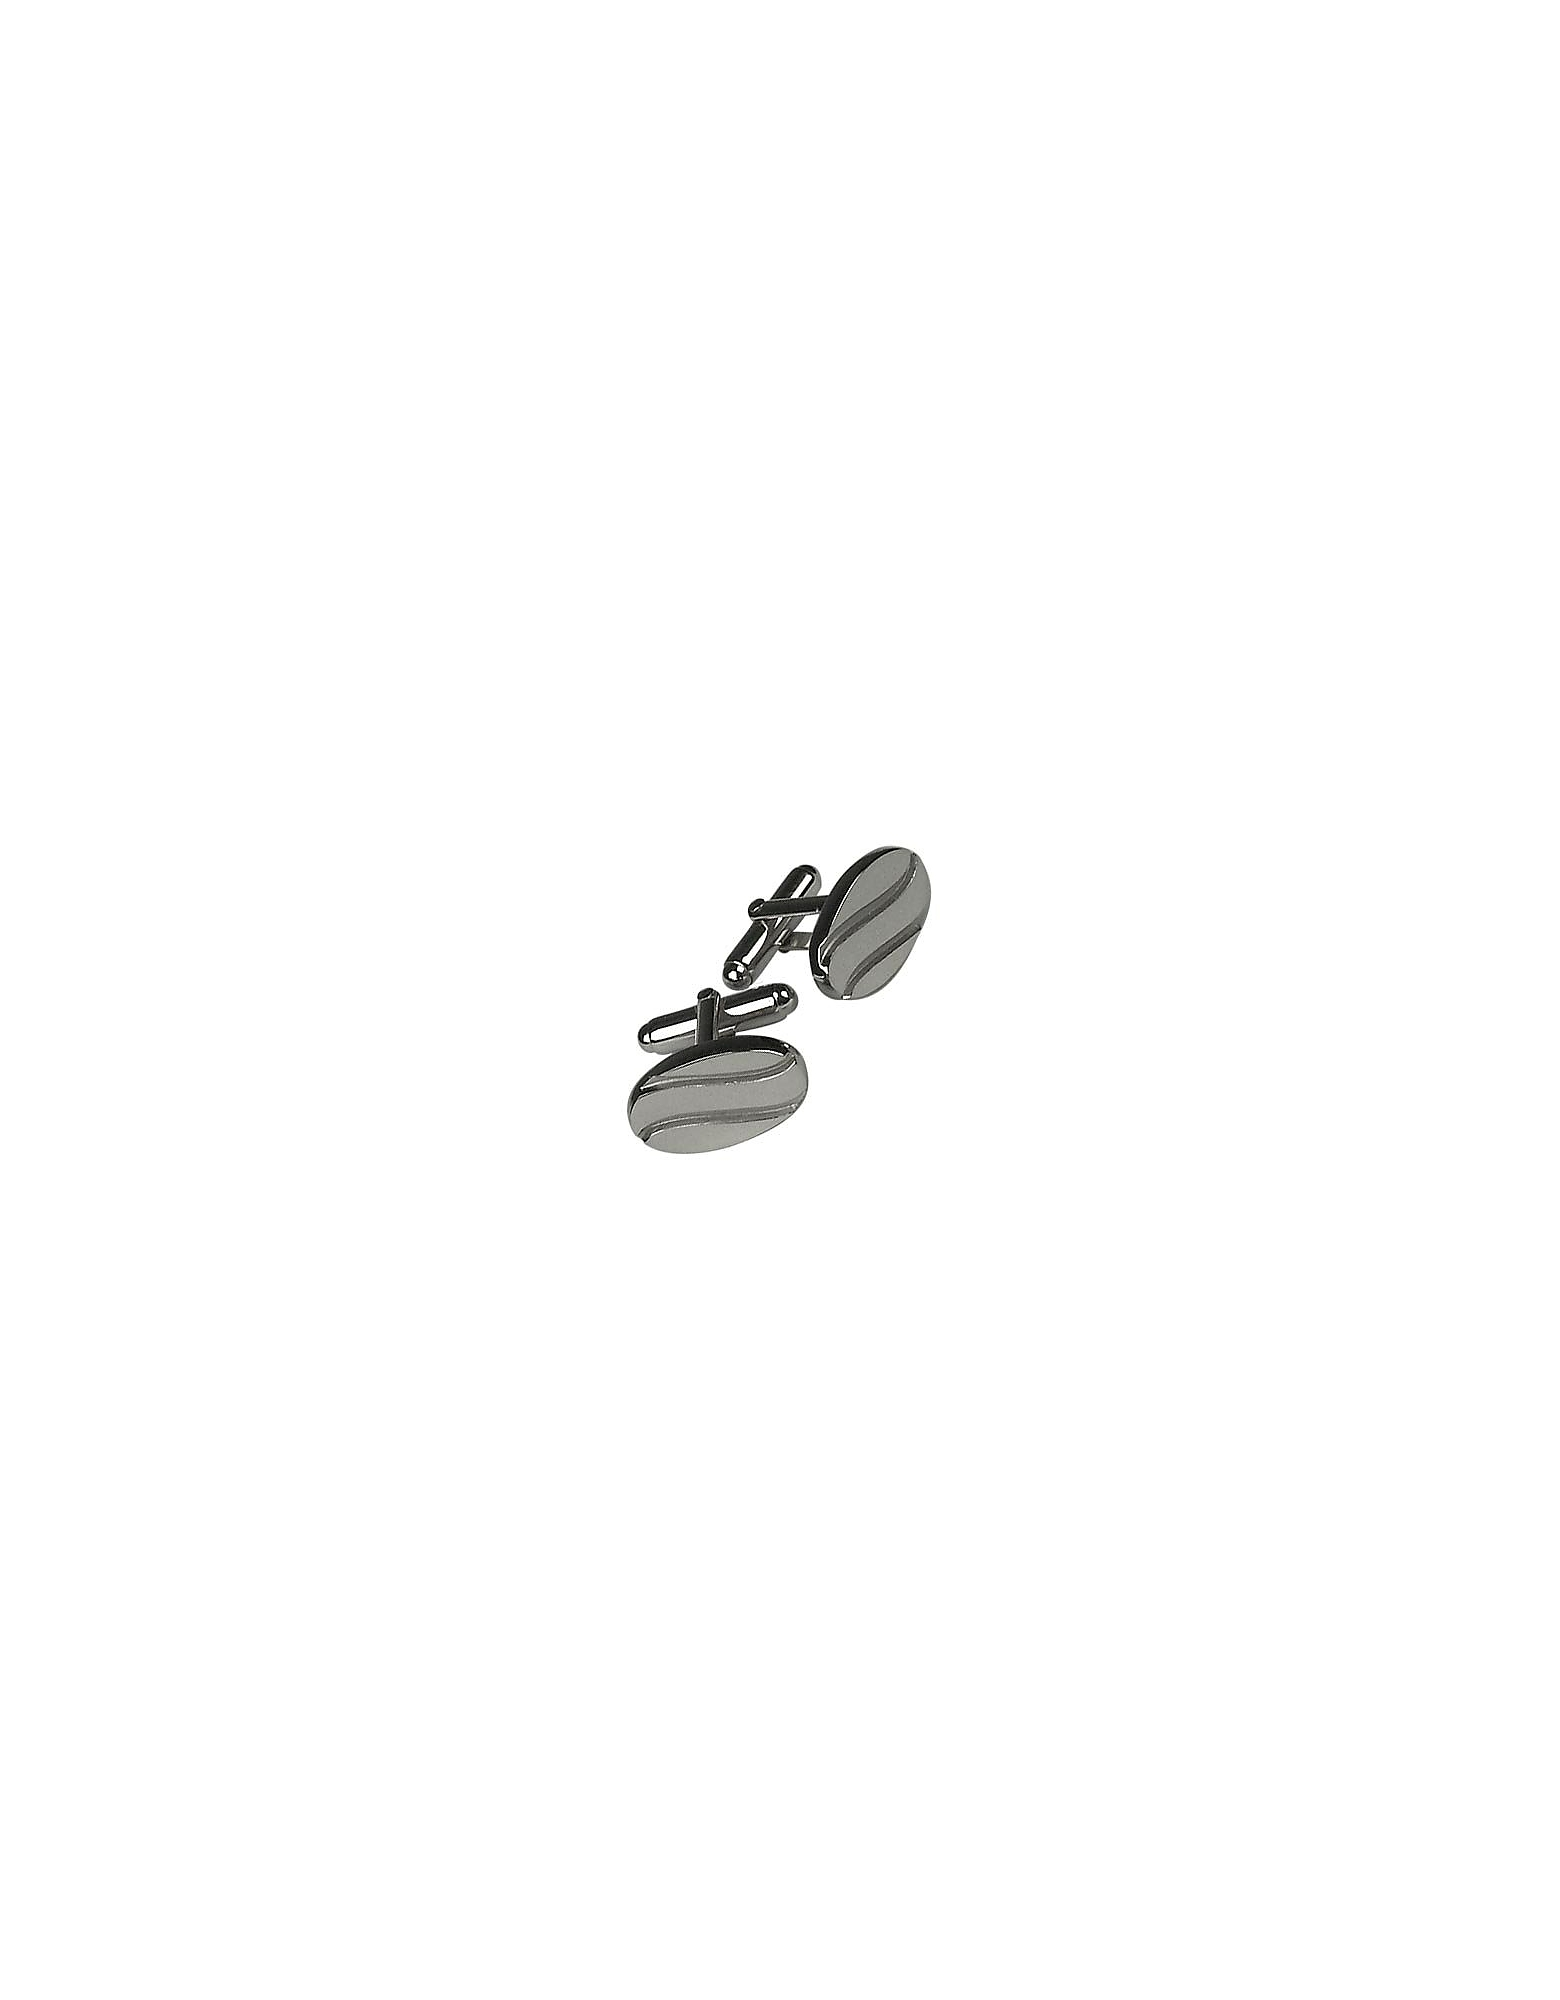 Forzieri Cufflinks, Silver Plated Stripes Cuff Links